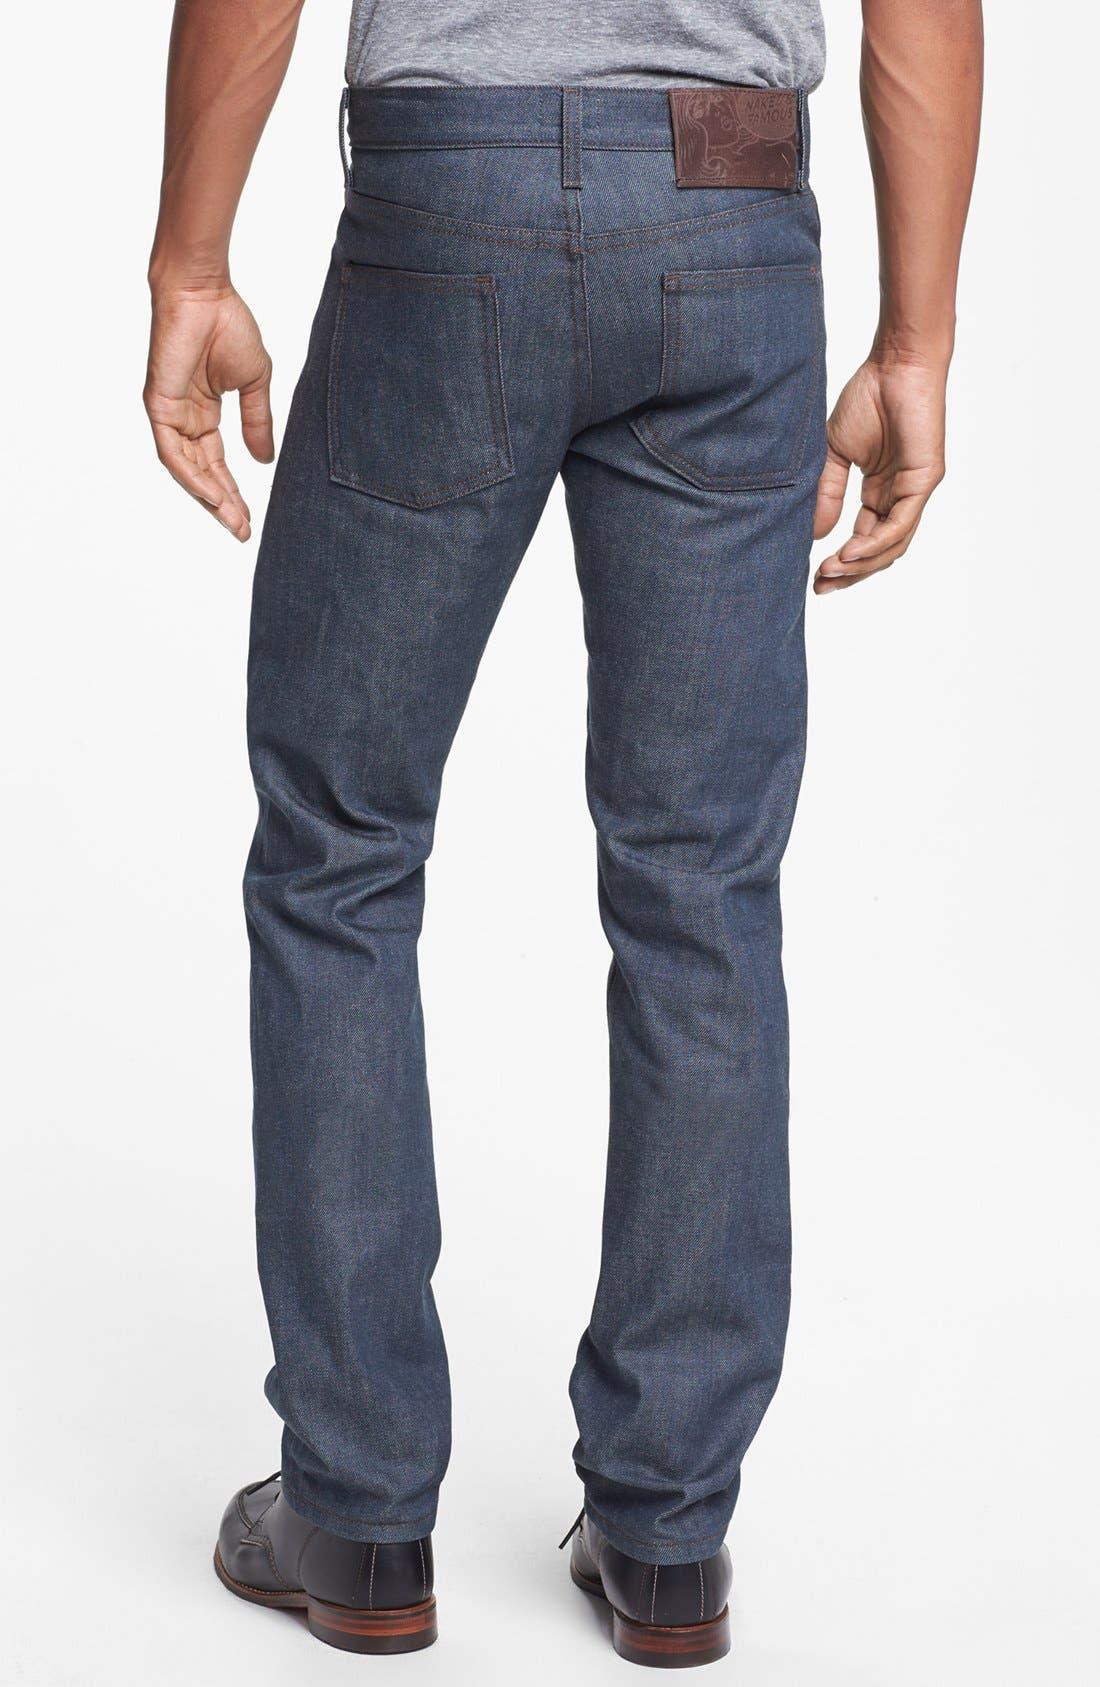 Alternate Image 1 Selected - Naked & Famous Denim 'Skinny Guy' Skinny Fit Selvedge Jeans